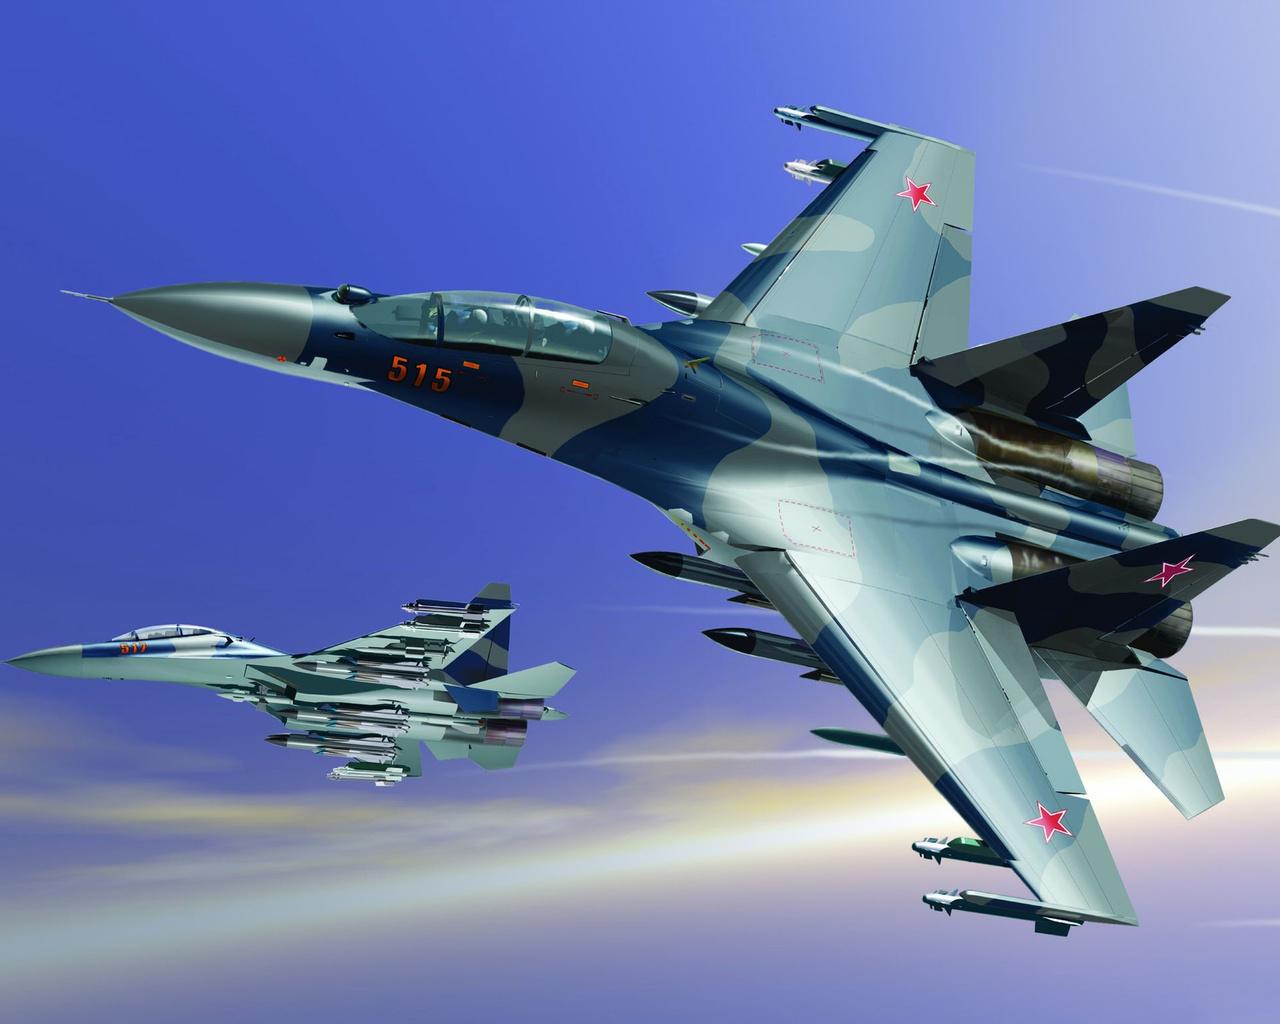 военная авиация россии картинки монетку онлайн можно